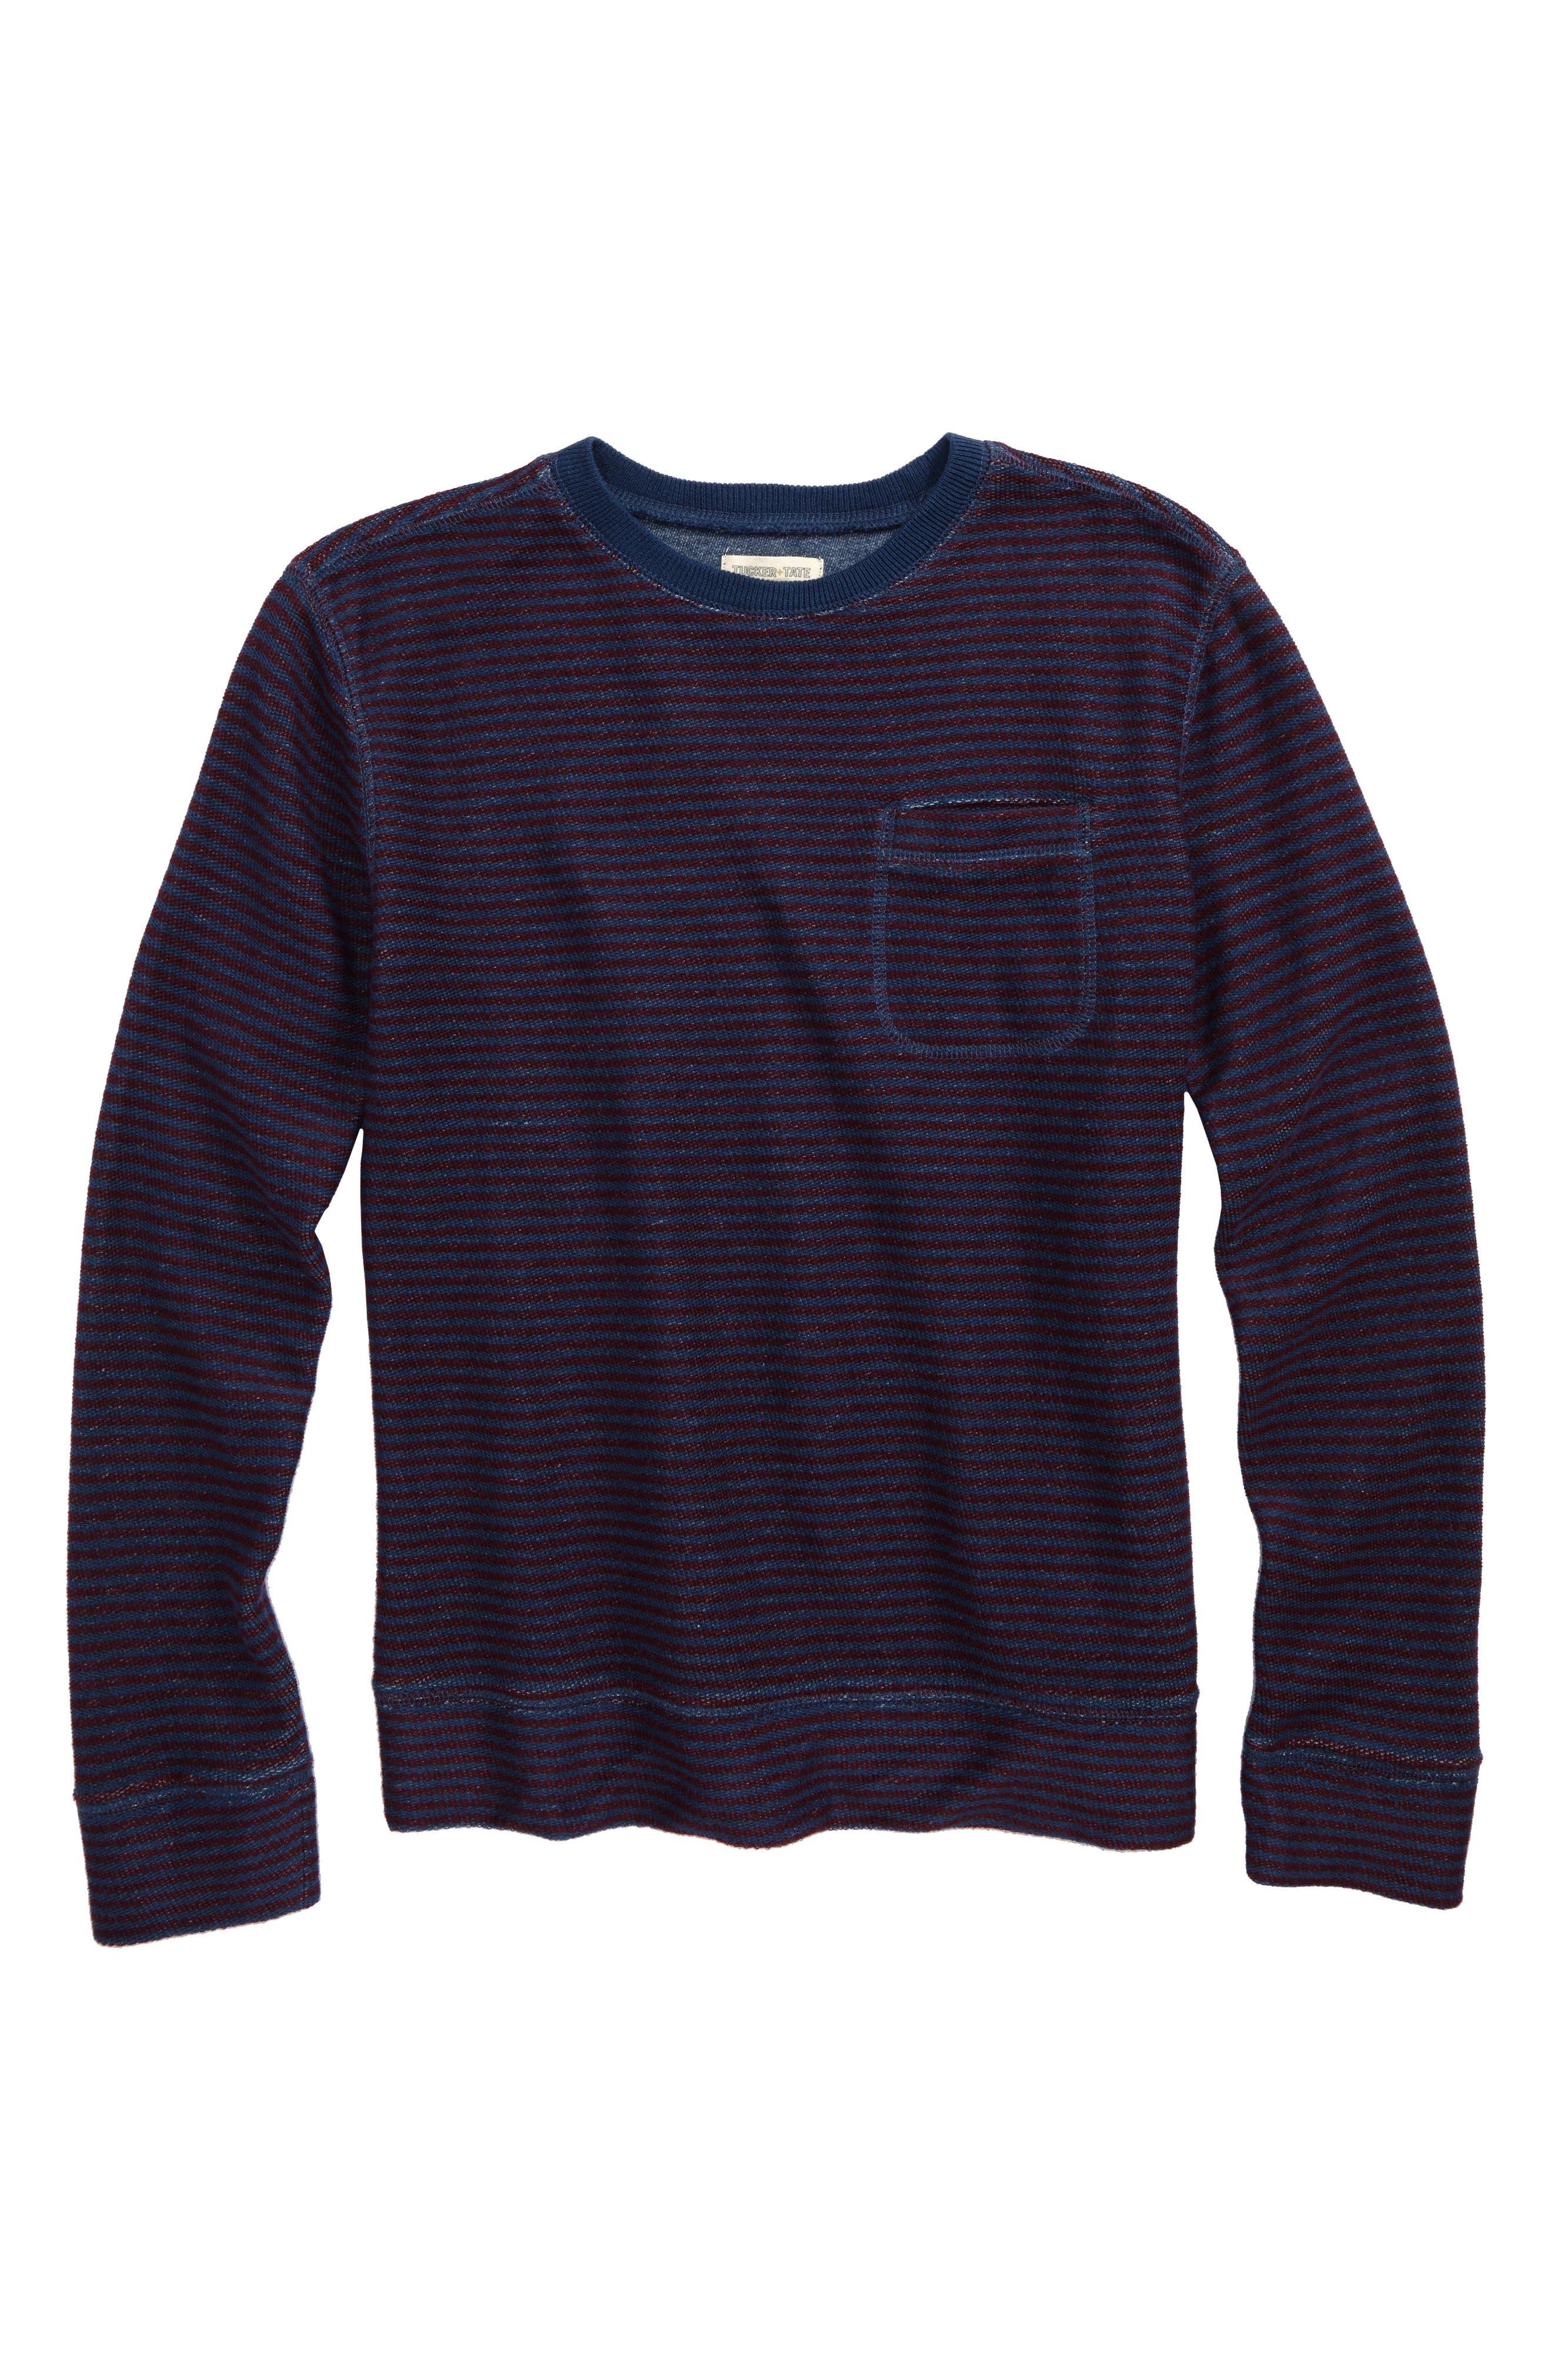 Stripe Crewneck Sweatshirt,                             Main thumbnail 1, color,                             410